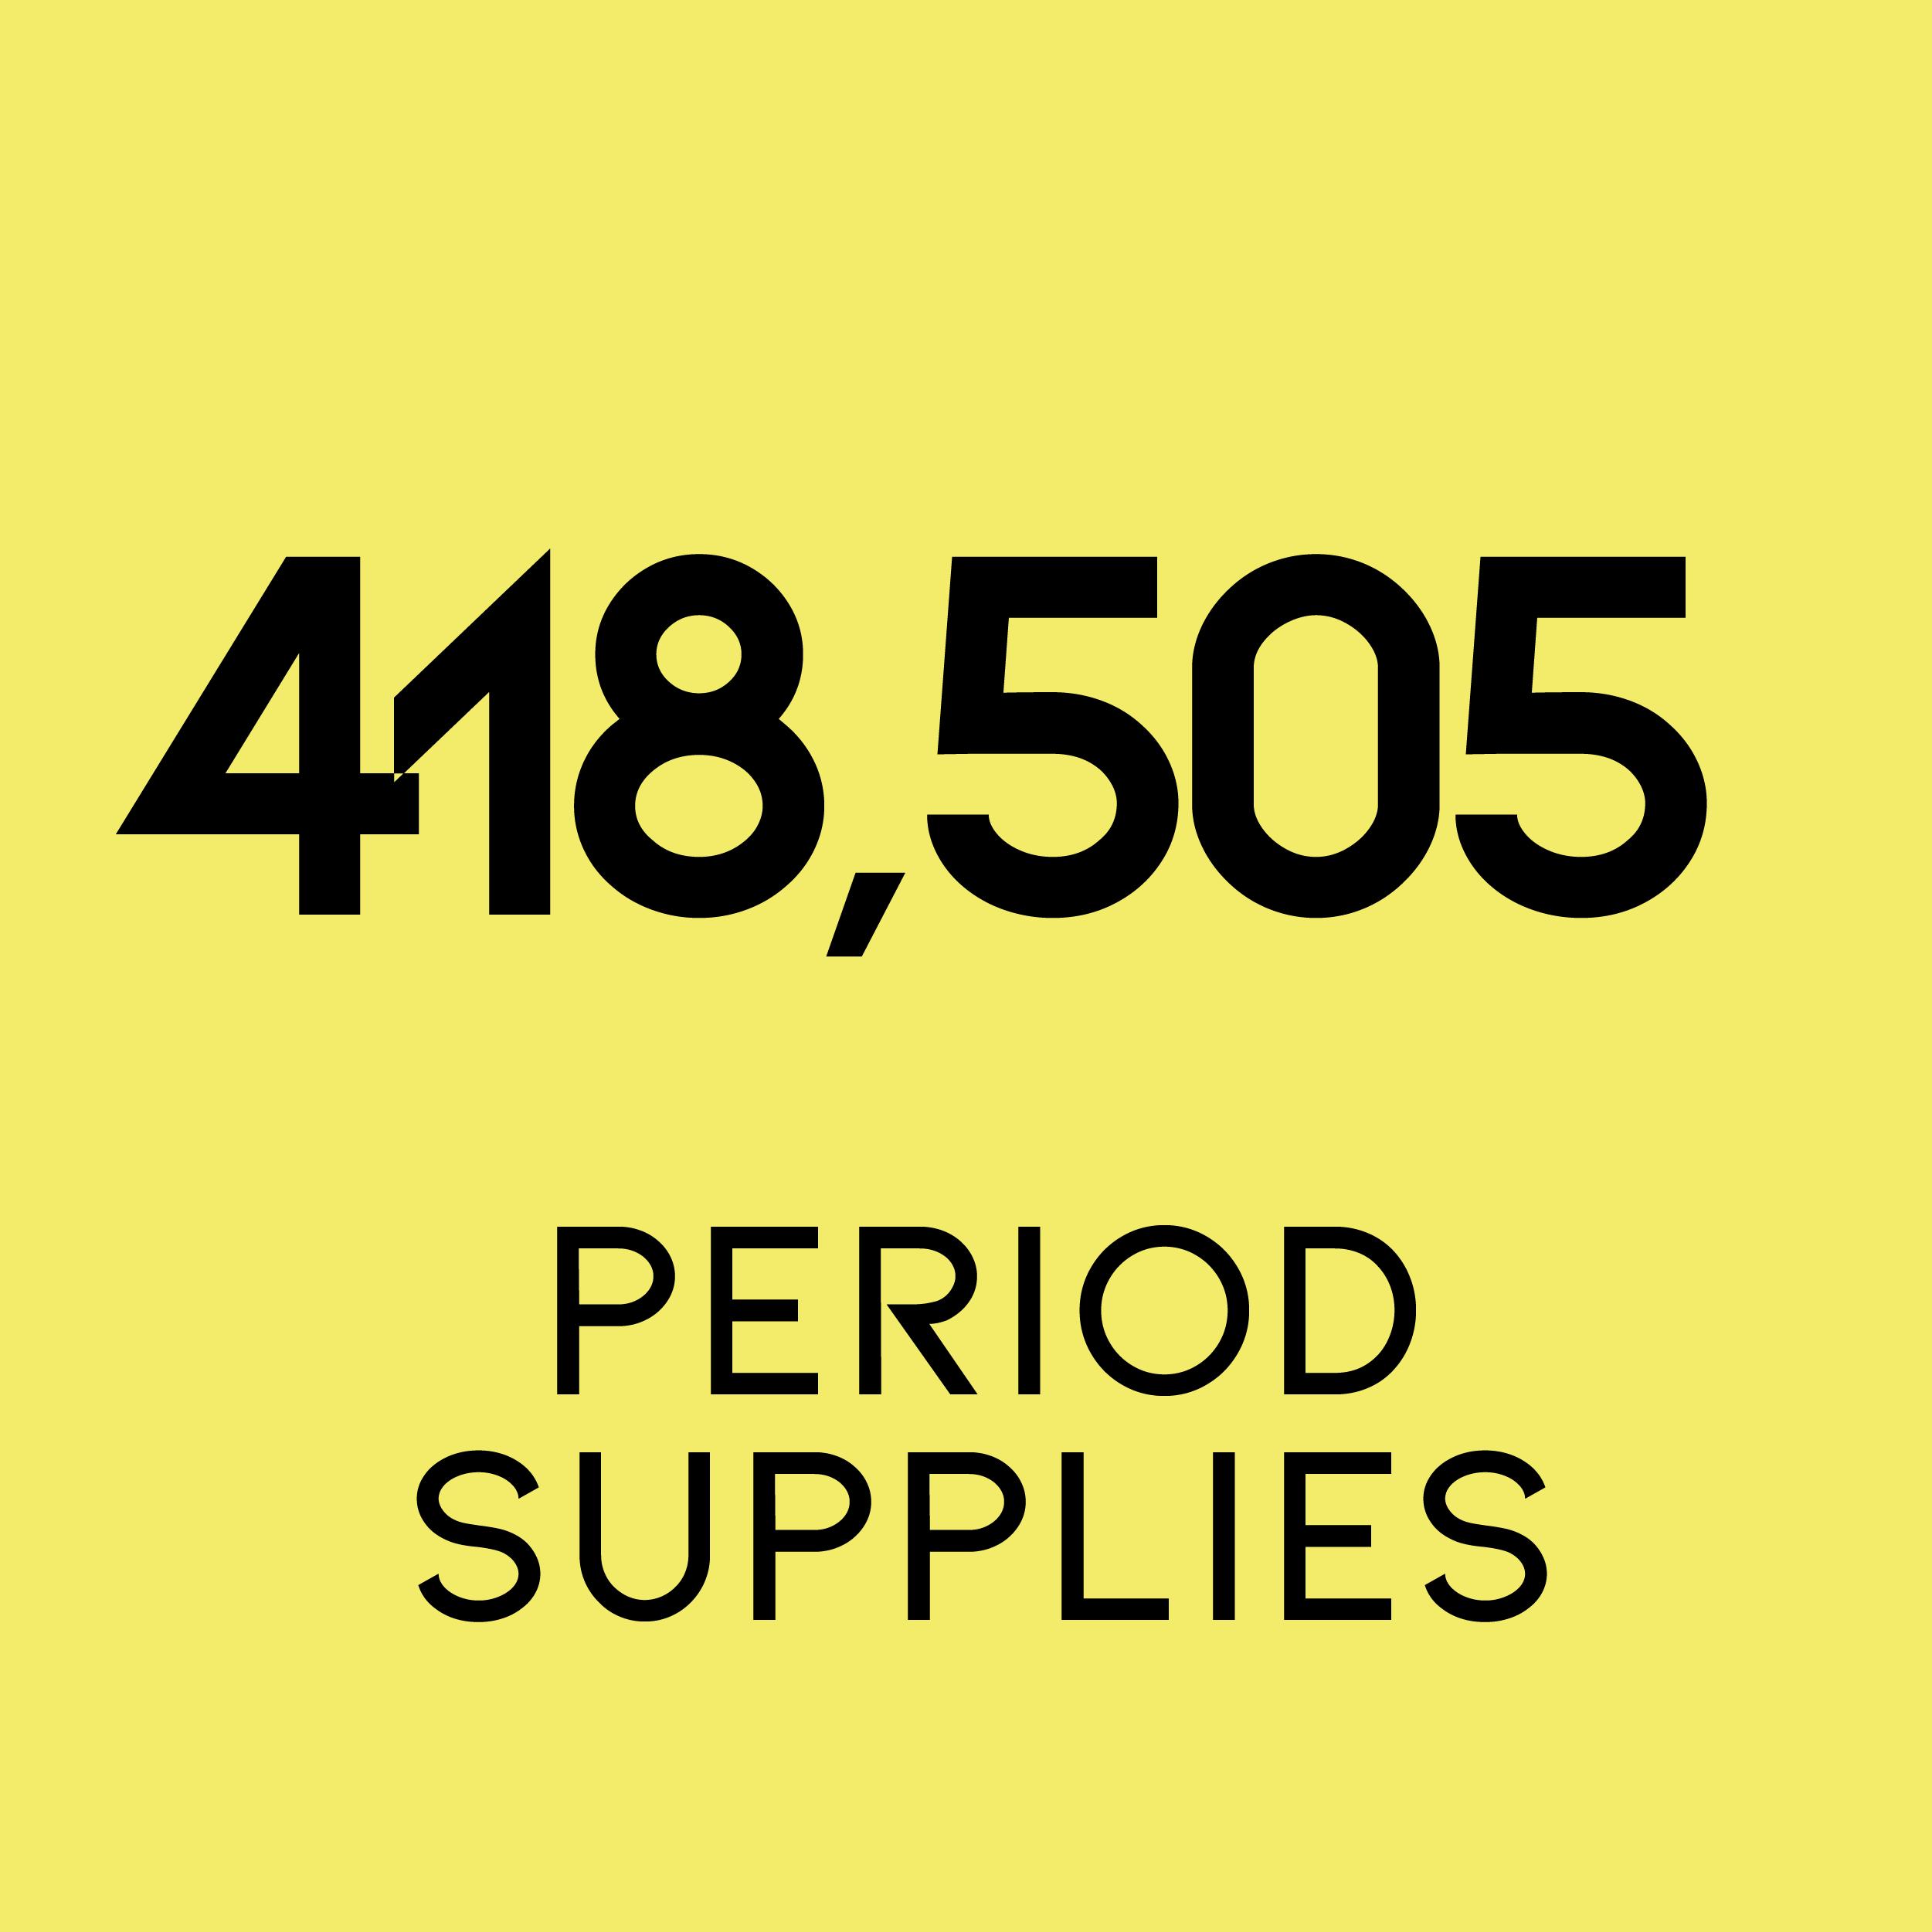 418,505 Period Supplies